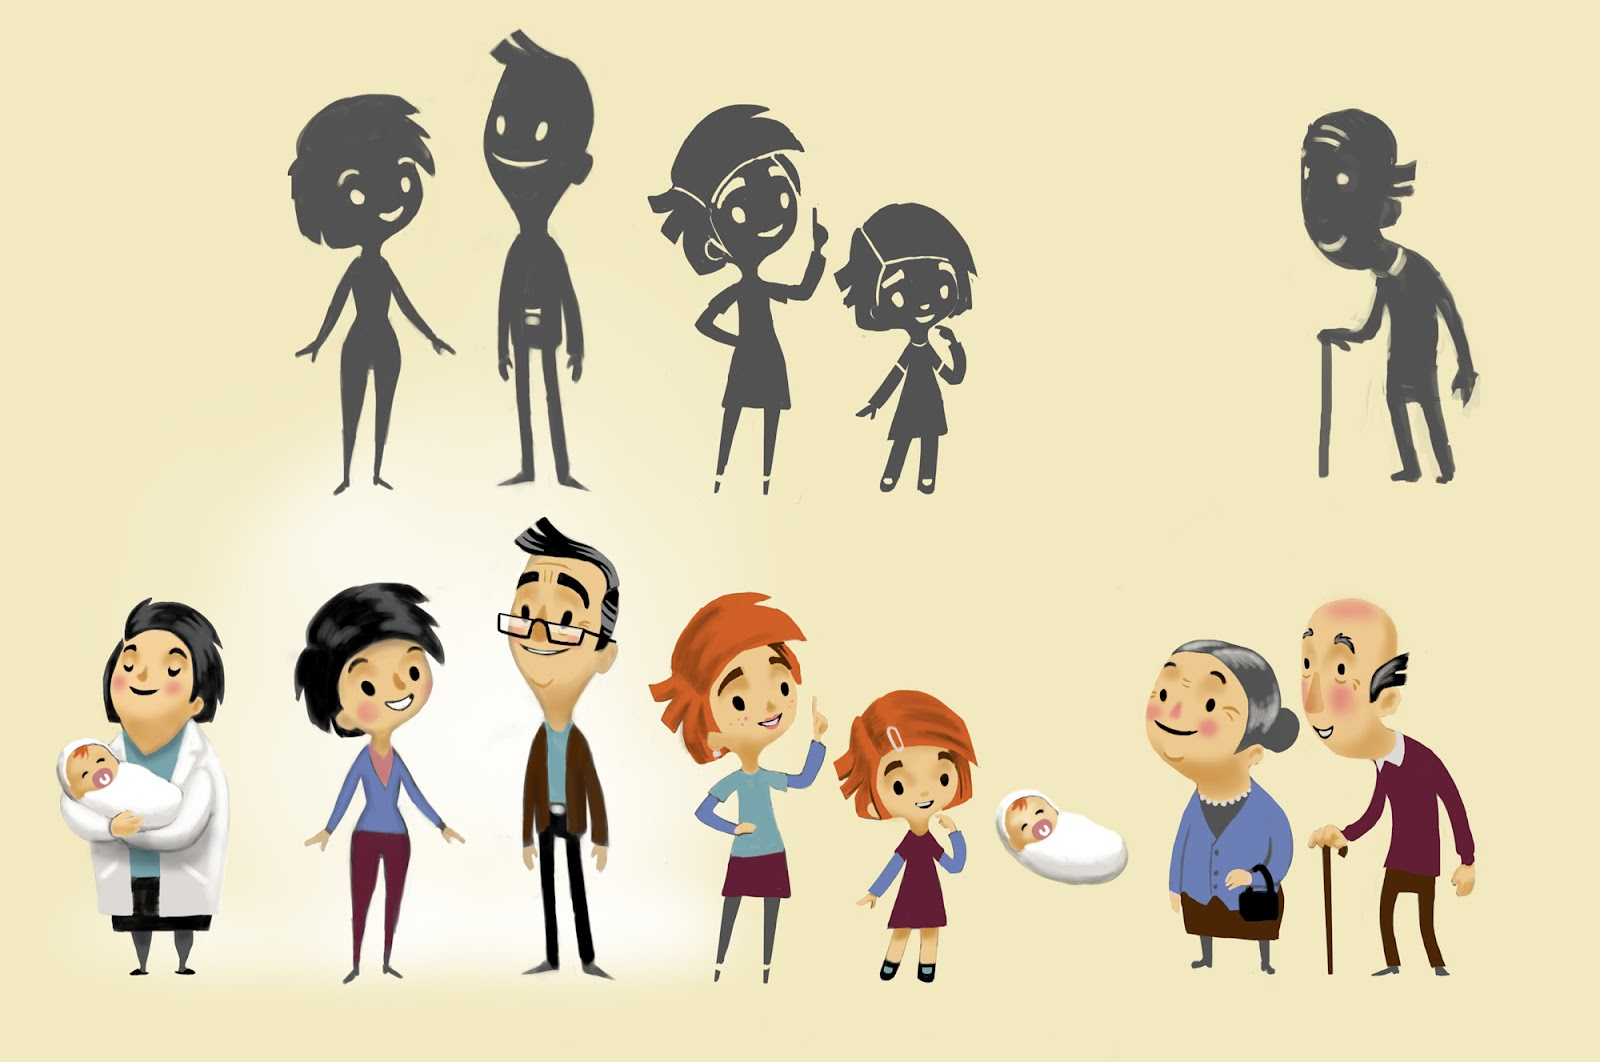 patrickgraf_characterdesign_ch_ch_01.jpg